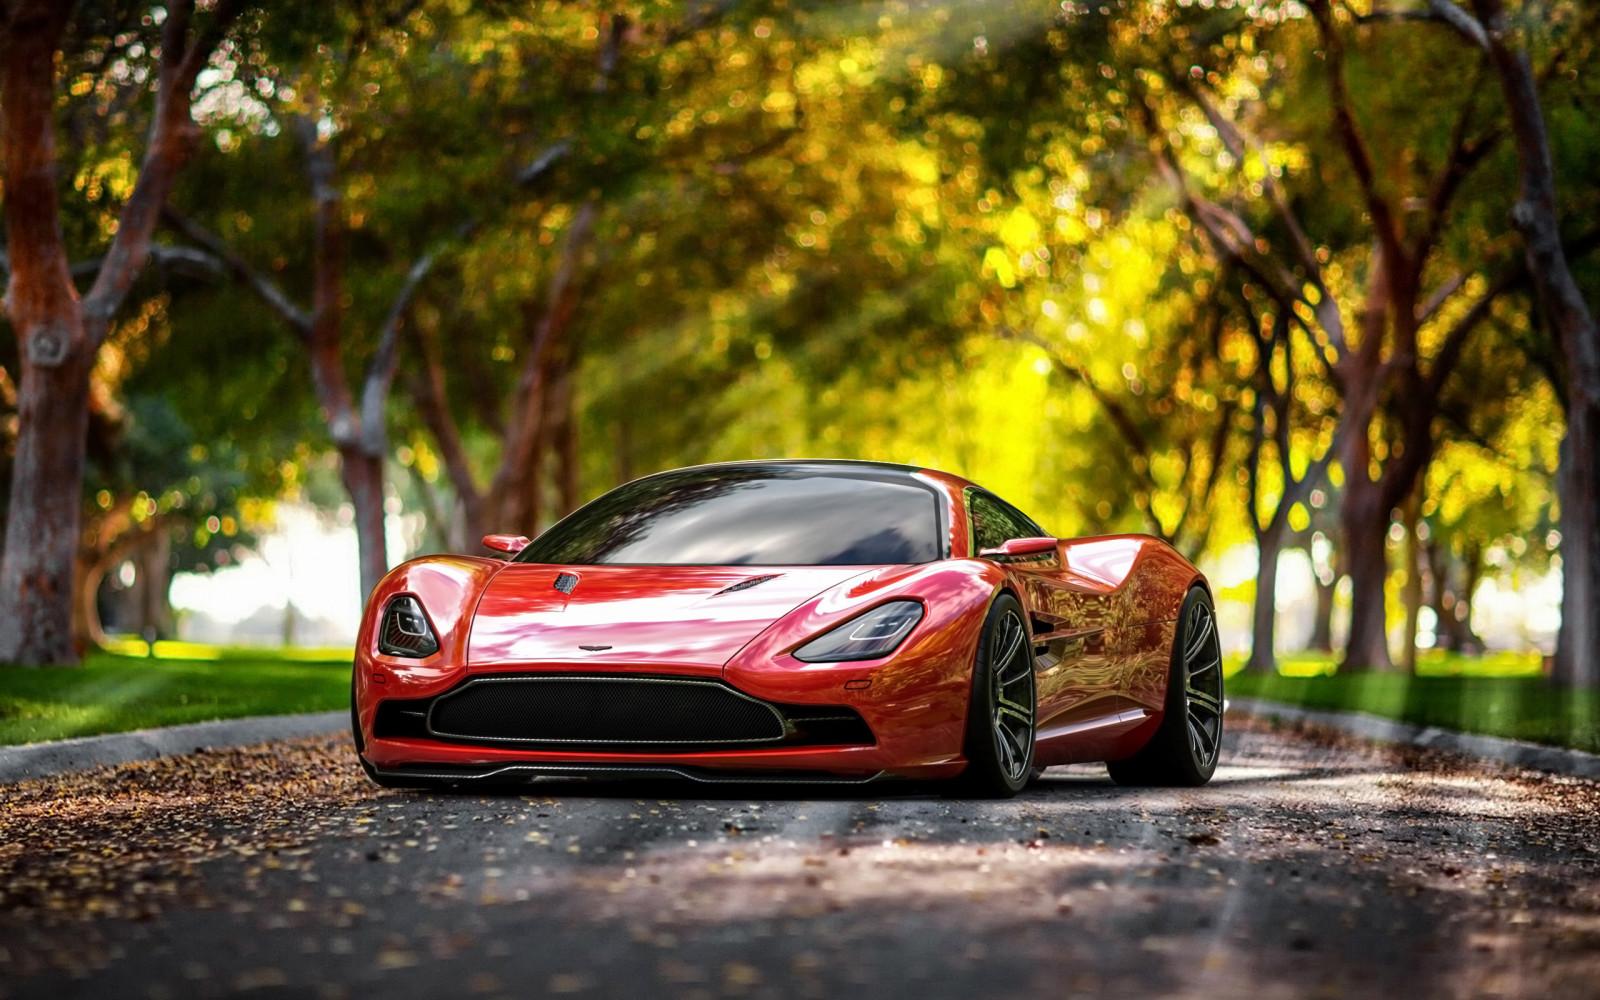 Aston Martin DBC Superb Concept 4k HD Wallpaper